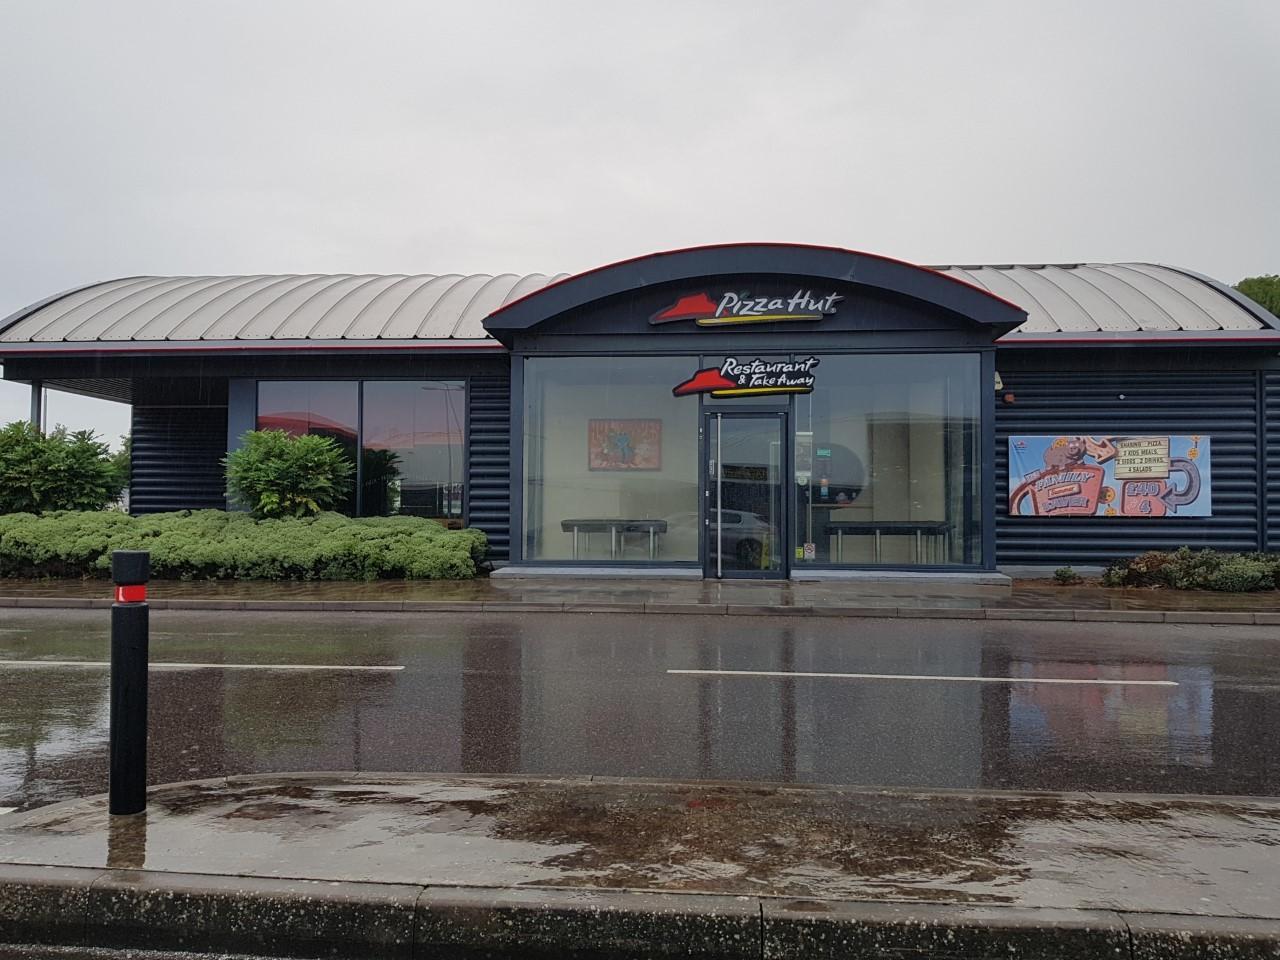 Pizza Hut Closure In Chippenham Hits Gazette Readers Hard